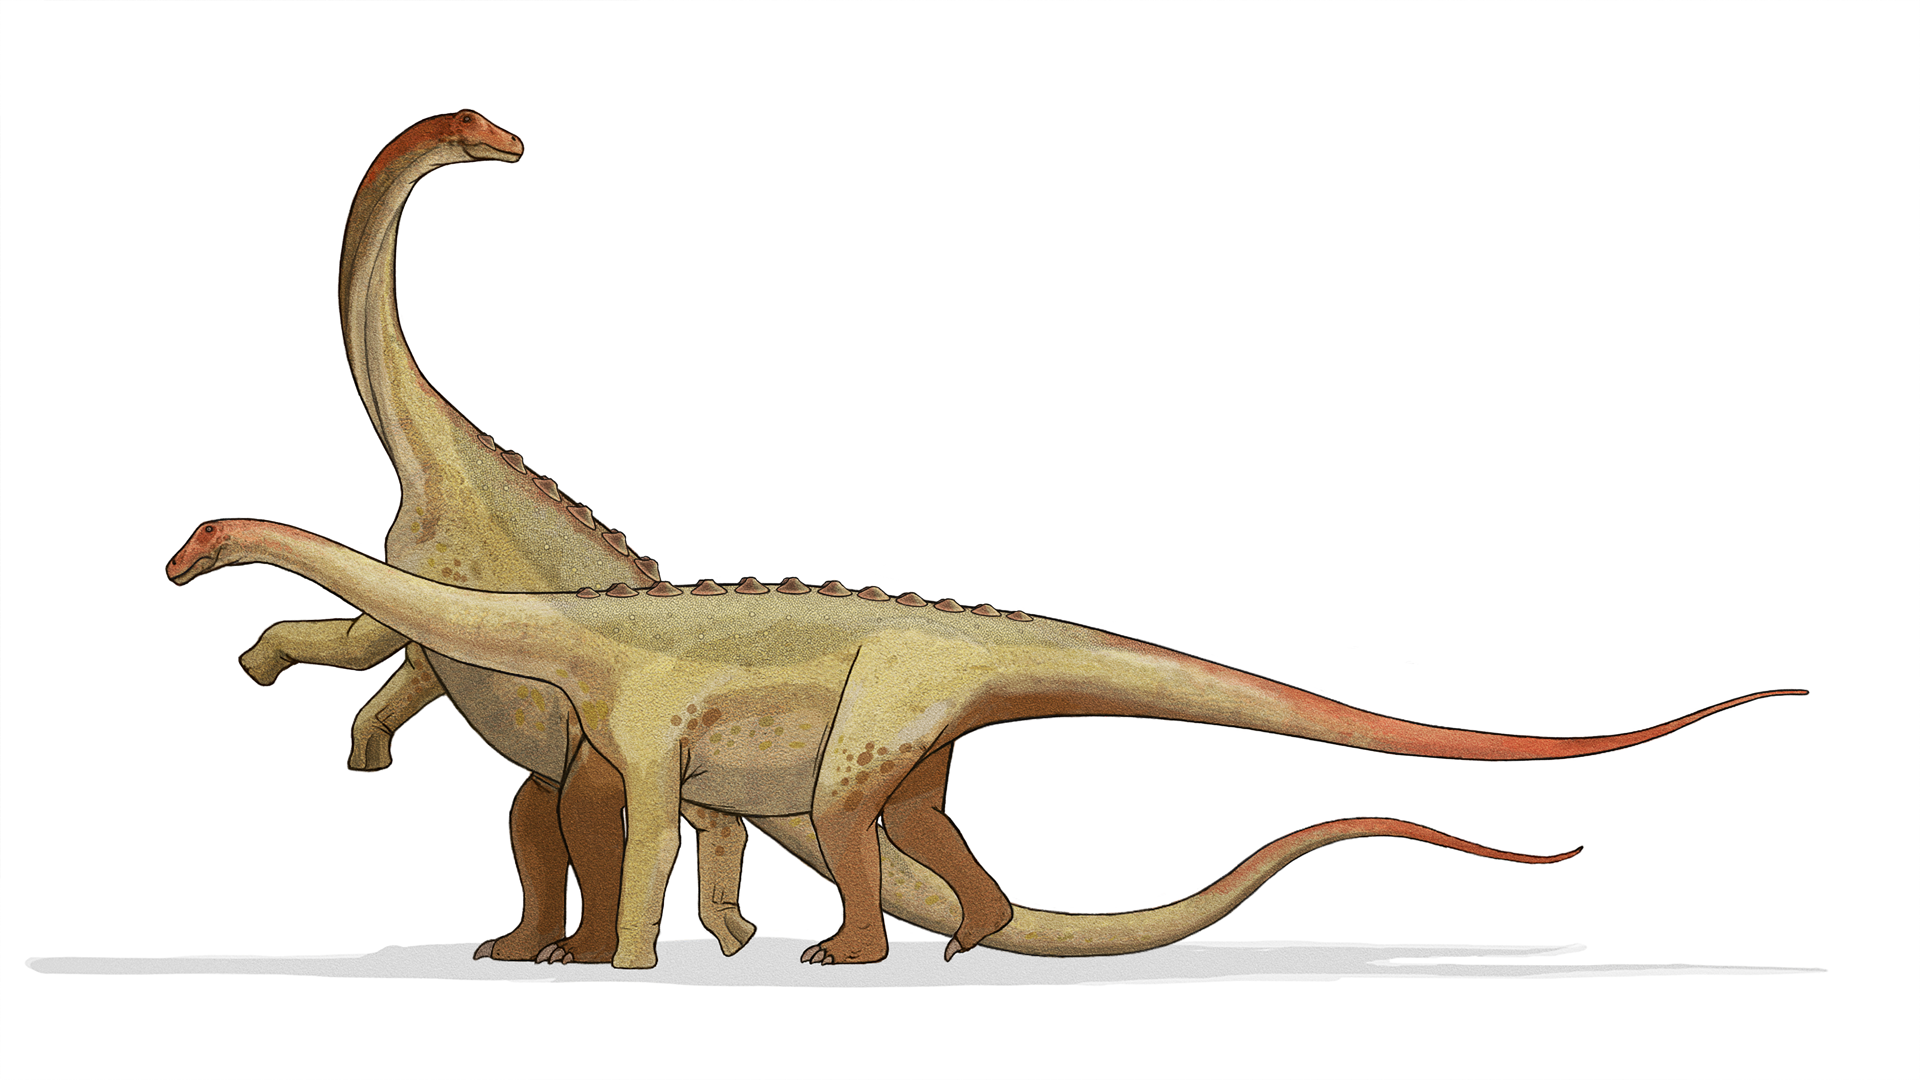 Widescreen Wallpapers: dinosaur image, 1920 x 1080 (925 kB)